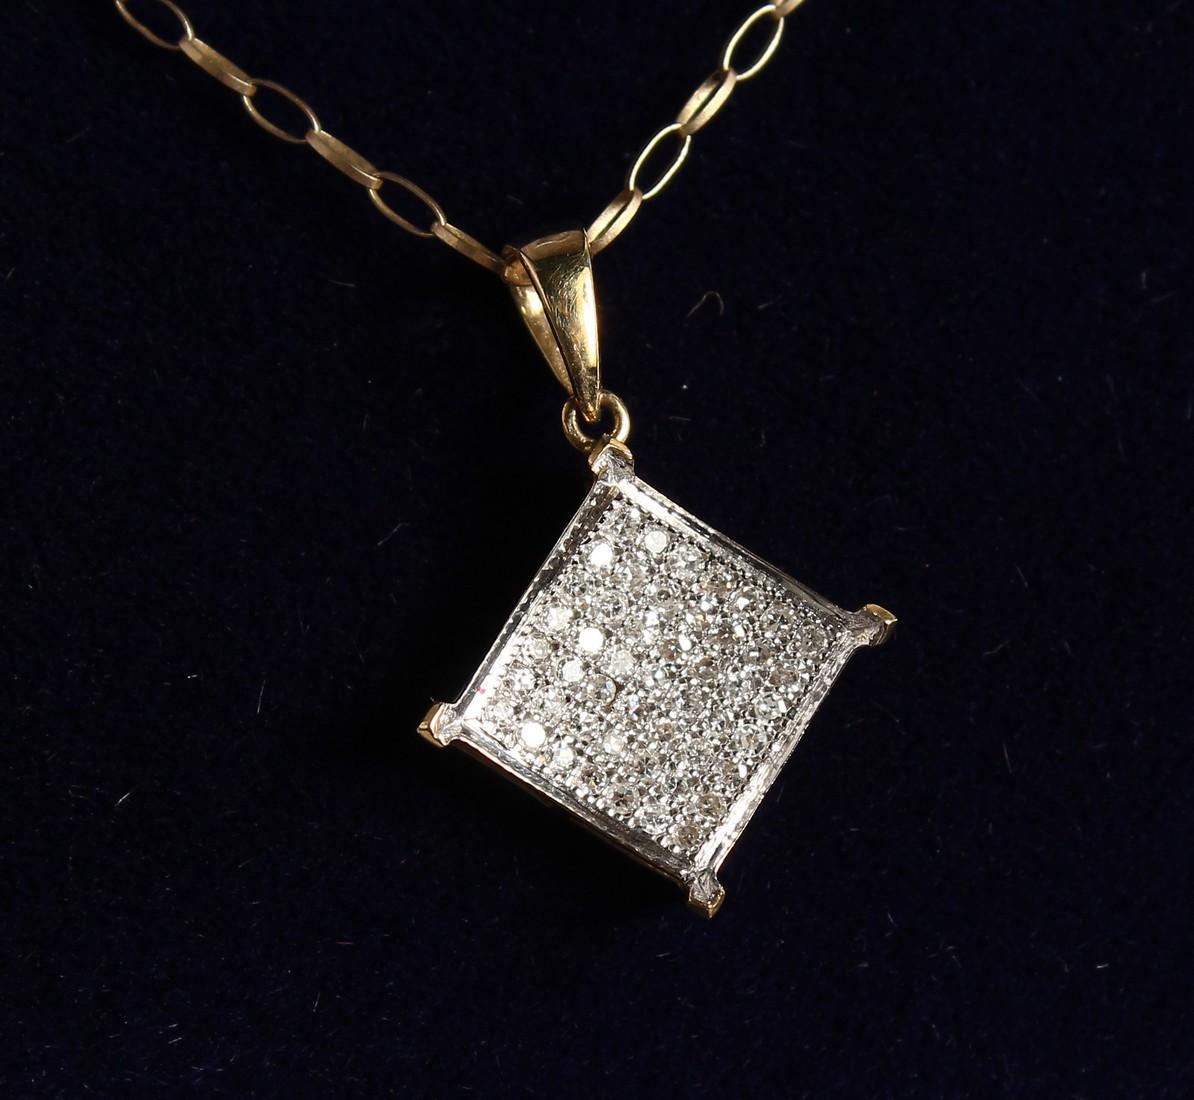 A 9CT GOLD AD DIAMOND PENDANT on a chain.